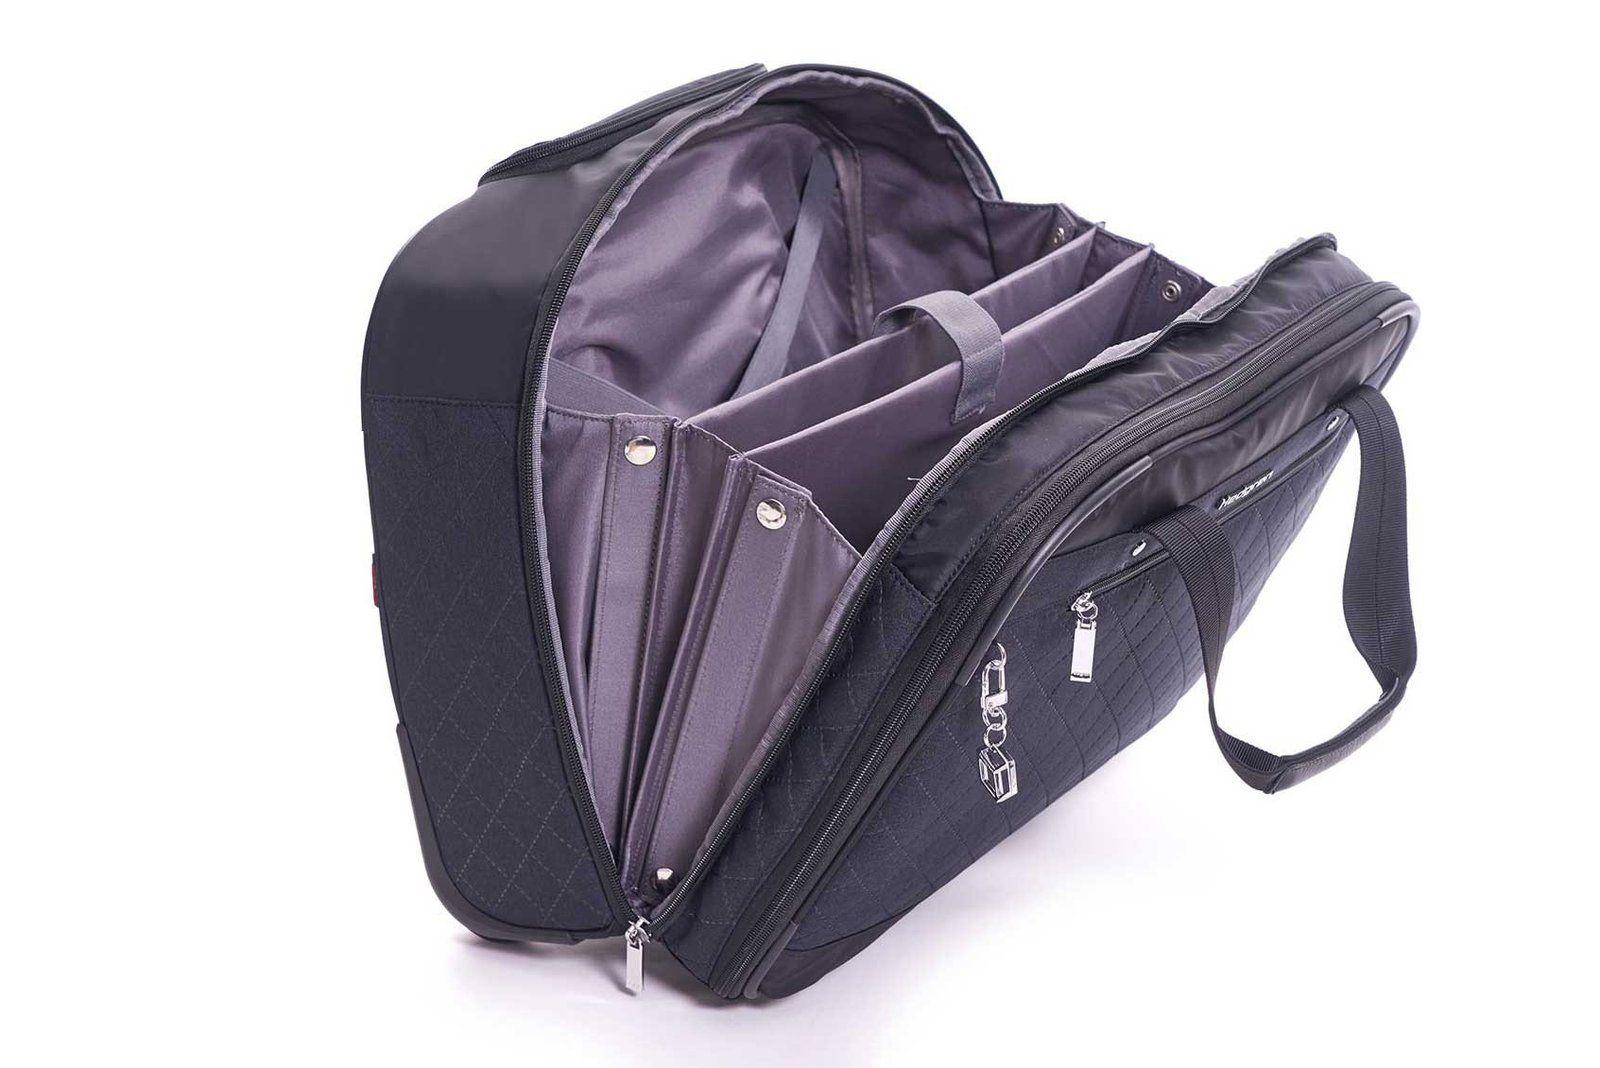 f493c475260d Women's Onyx Mobile Office Bag Diamond Star Collection Hedgren ...